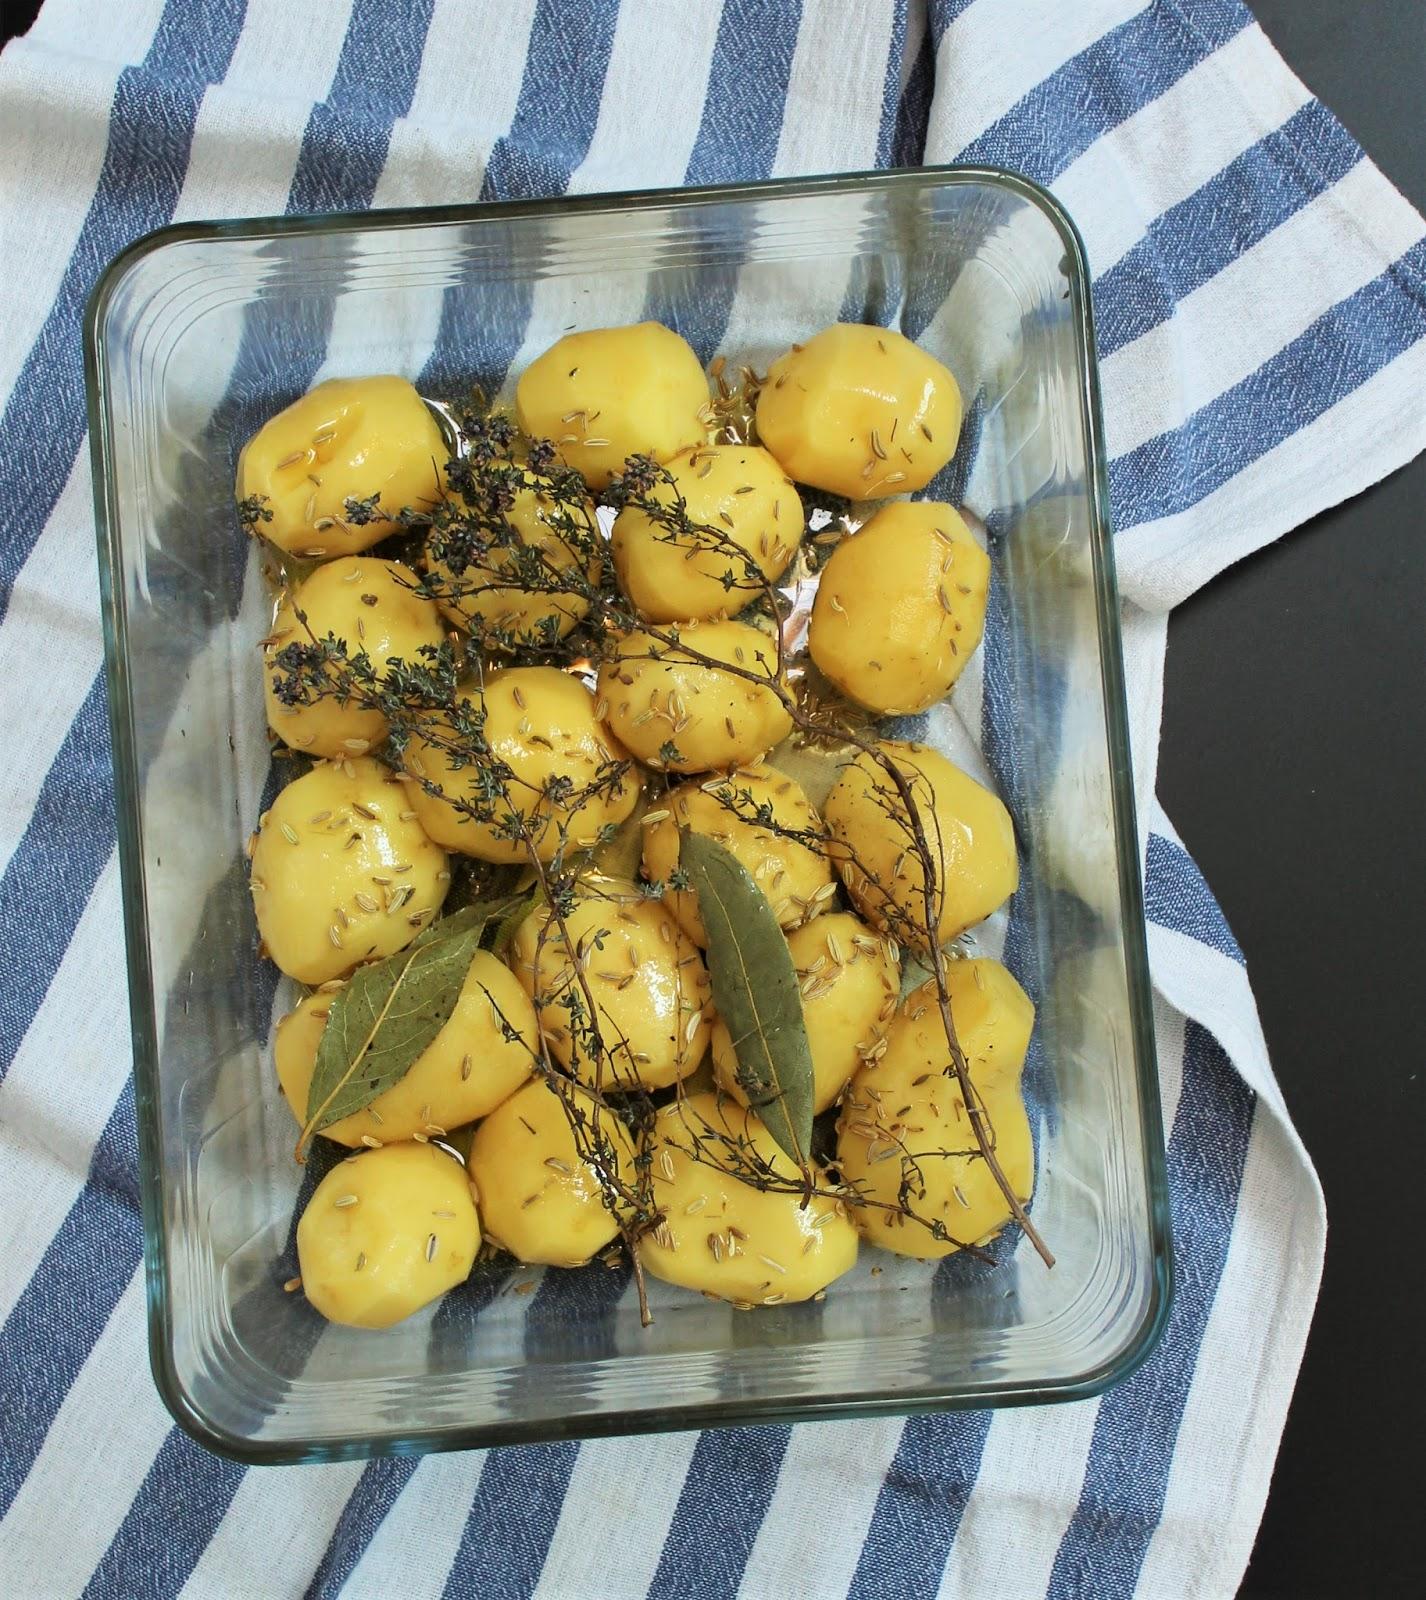 diana 39 s cook blog pommes de terre r ties aux herbes et. Black Bedroom Furniture Sets. Home Design Ideas